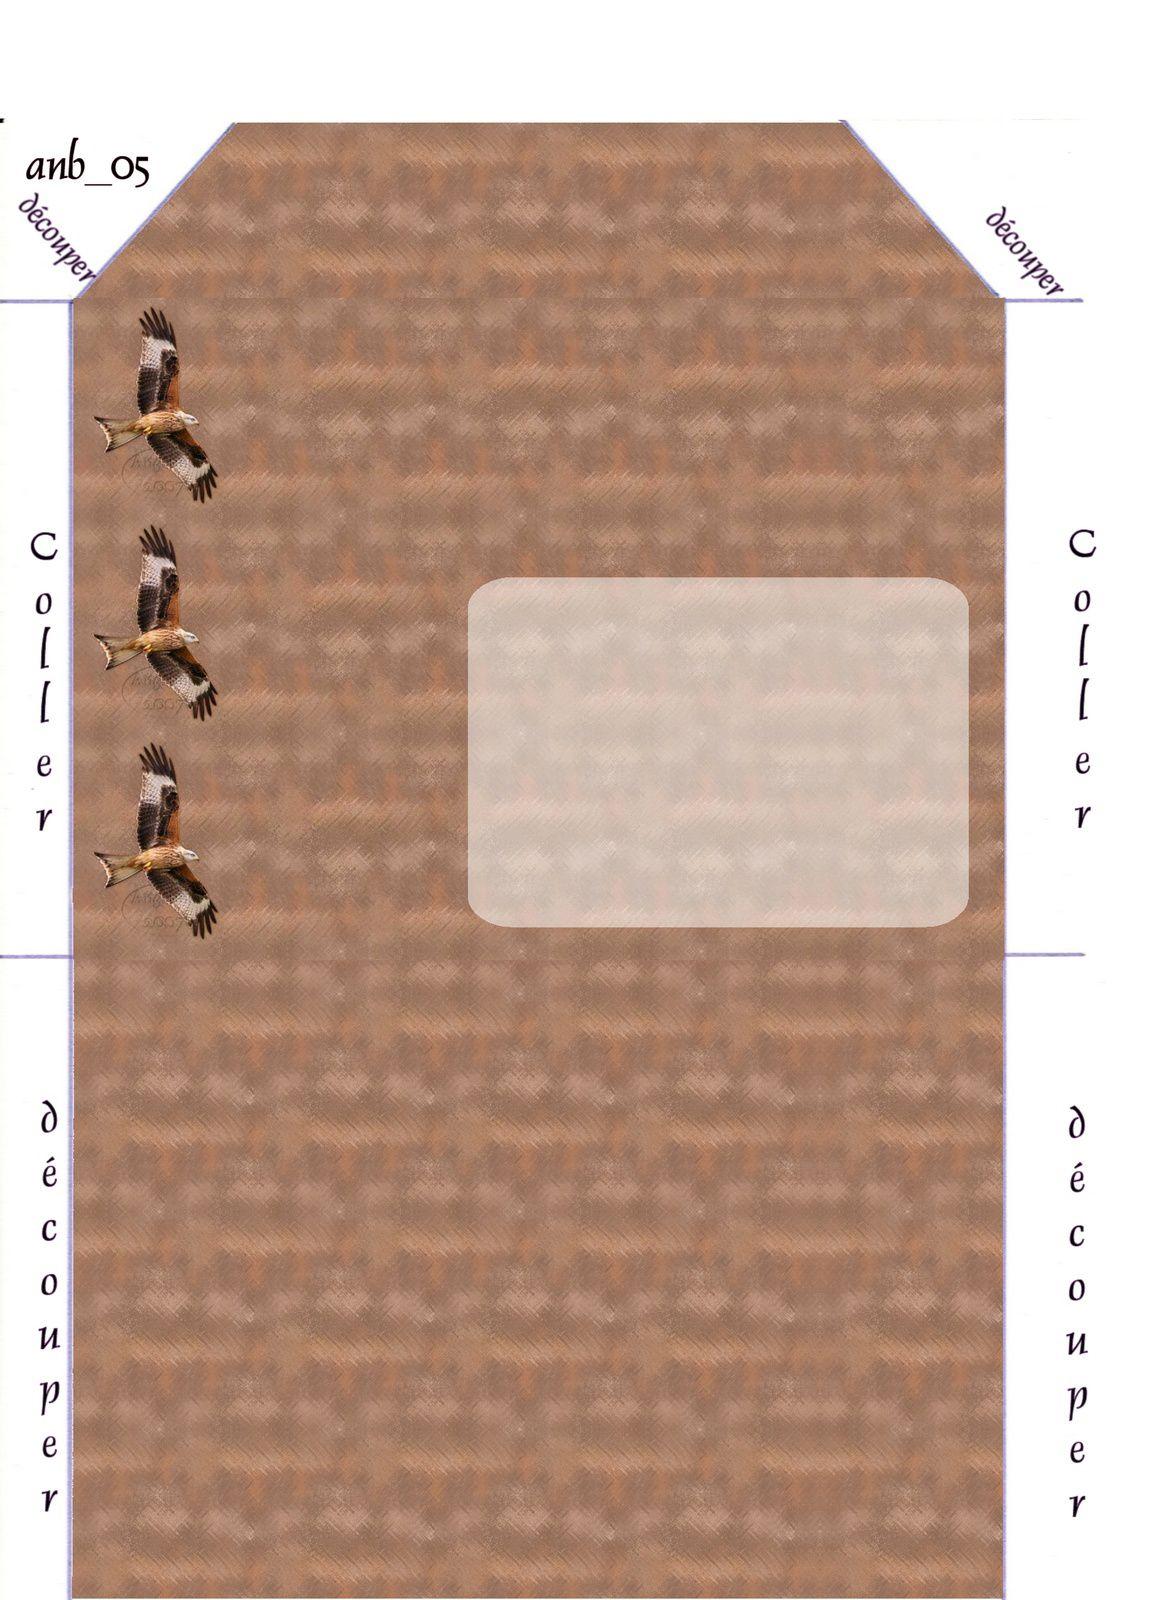 Aigle Oiseau Incredimail &amp&#x3B; Papier A4 h l &amp&#x3B; outlook &amp&#x3B; enveloppe &amp&#x3B; 2 cartes A5 &amp&#x3B; signets 3 langues   ois_saphiere_bird_44_a